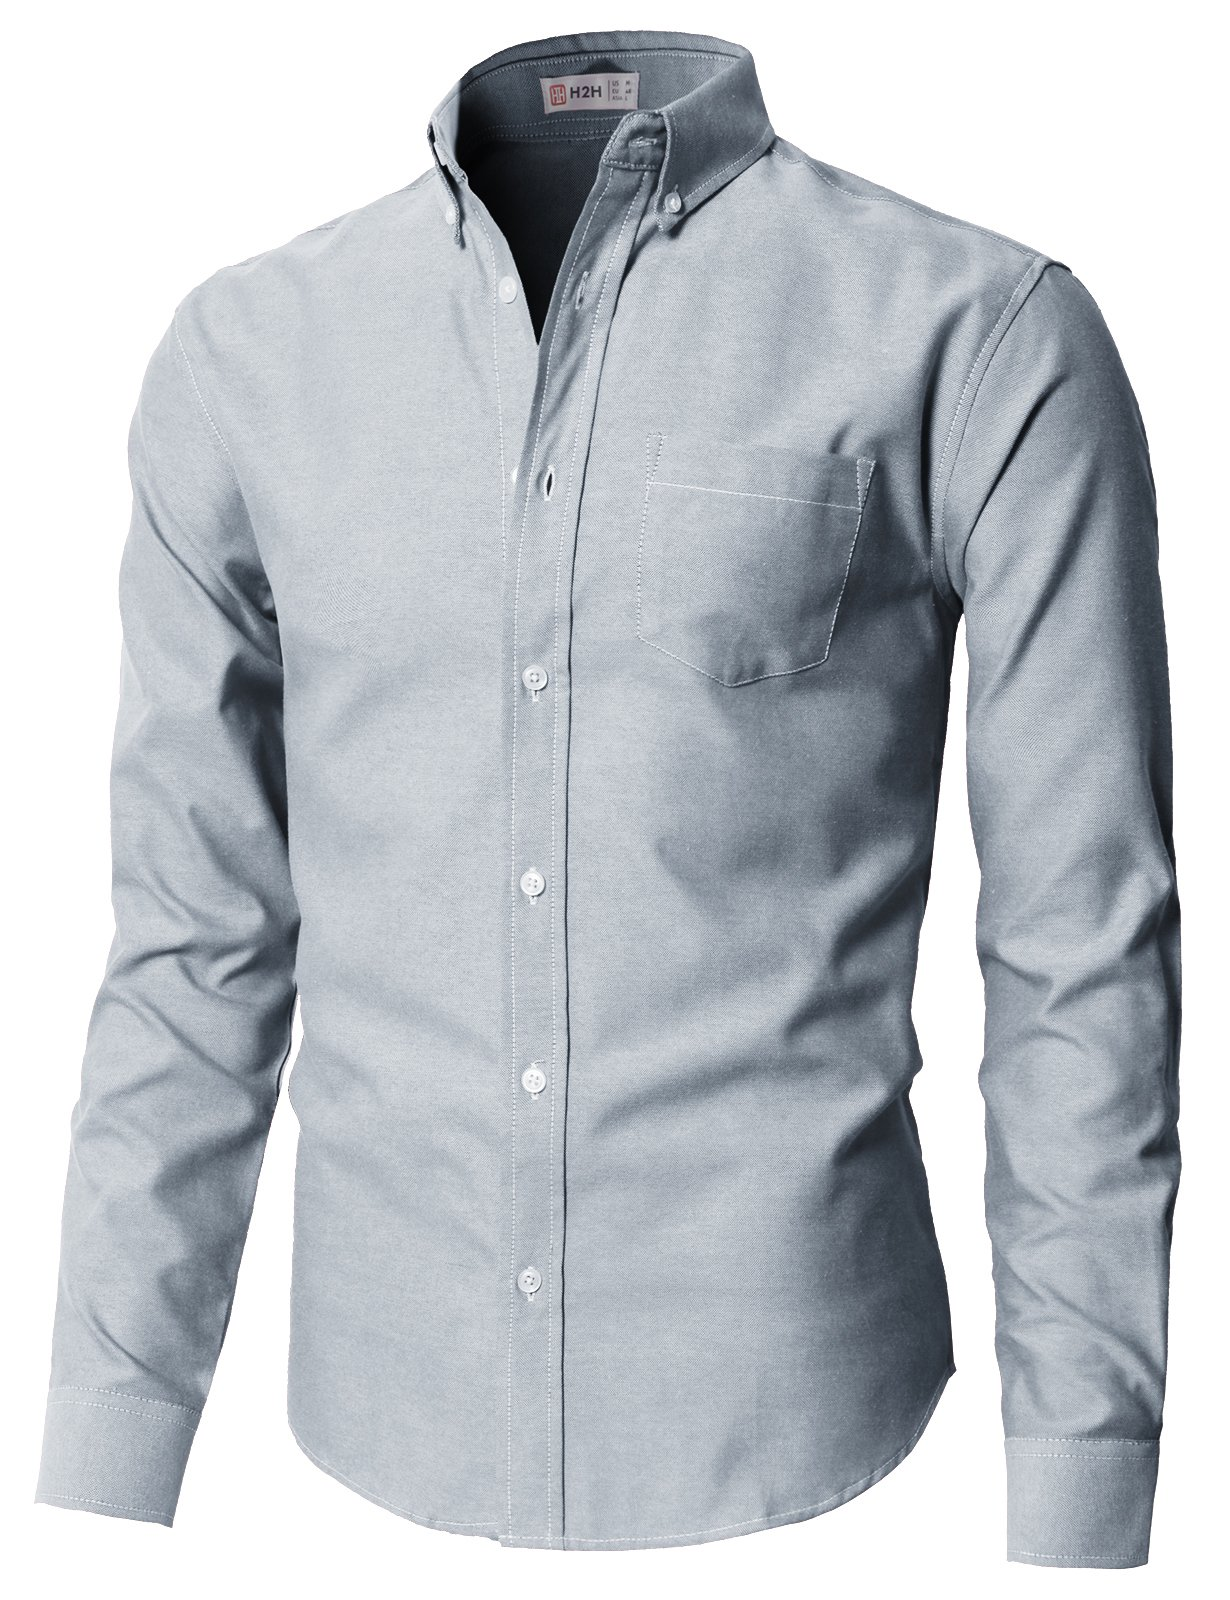 H2H Men's Clampert Worn in Oxford Long Sleeve Shirt Navy US M/Asia L (KMTSTL0521)